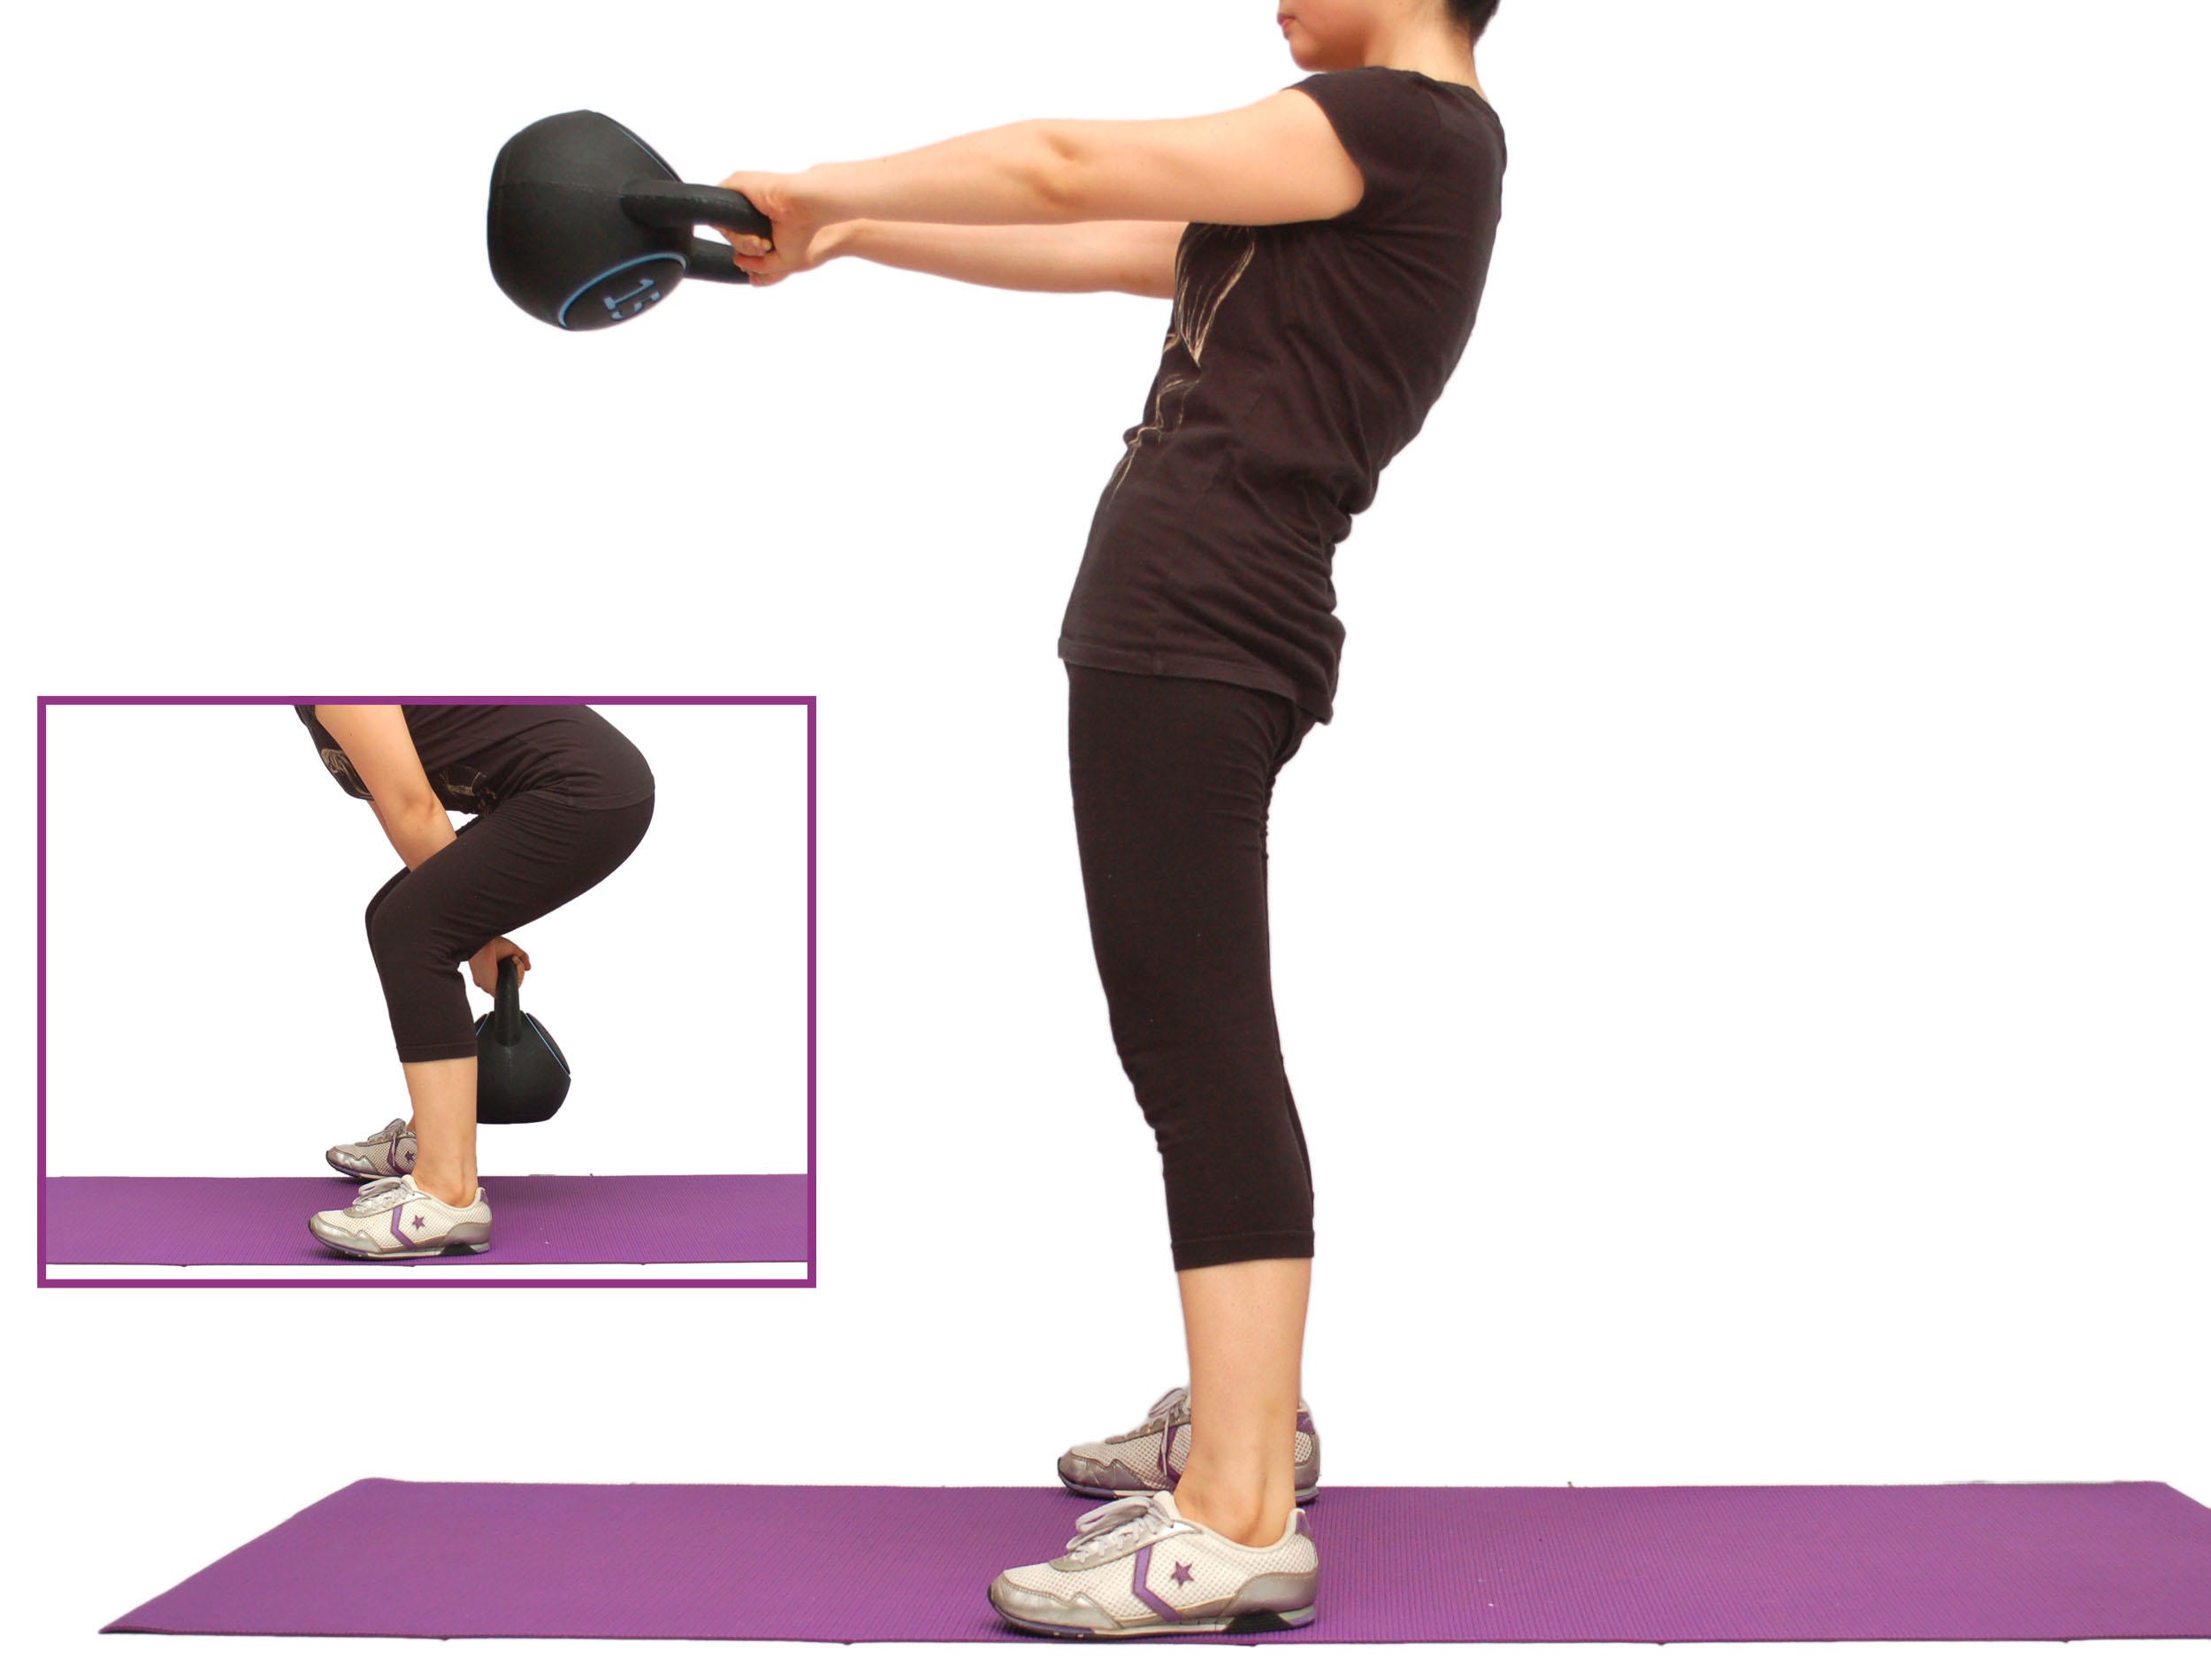 Do-the-Kettlebell-1-Minute-Burn-Fat-Exercise-Step-7